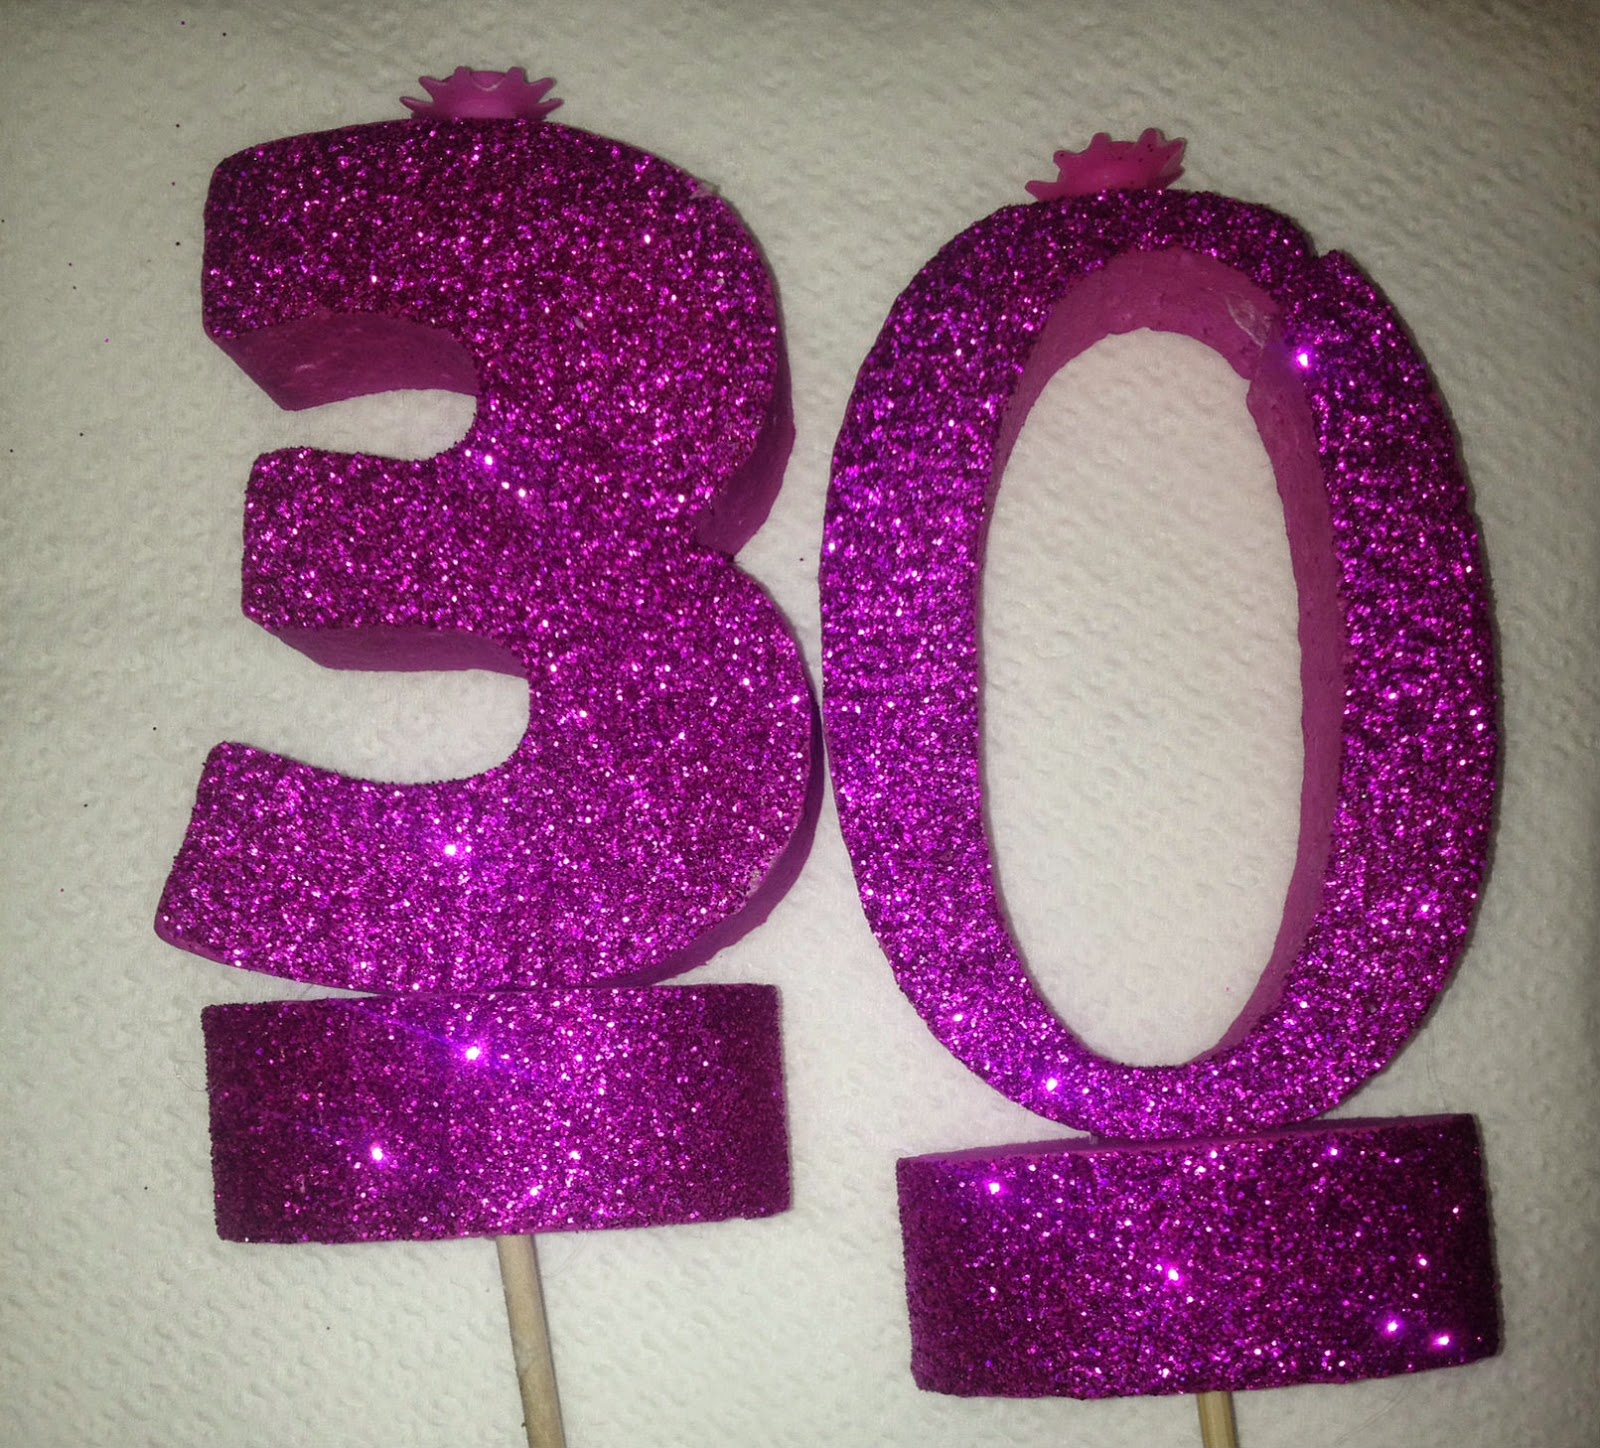 compleanno a tema glitter,candele glitterate